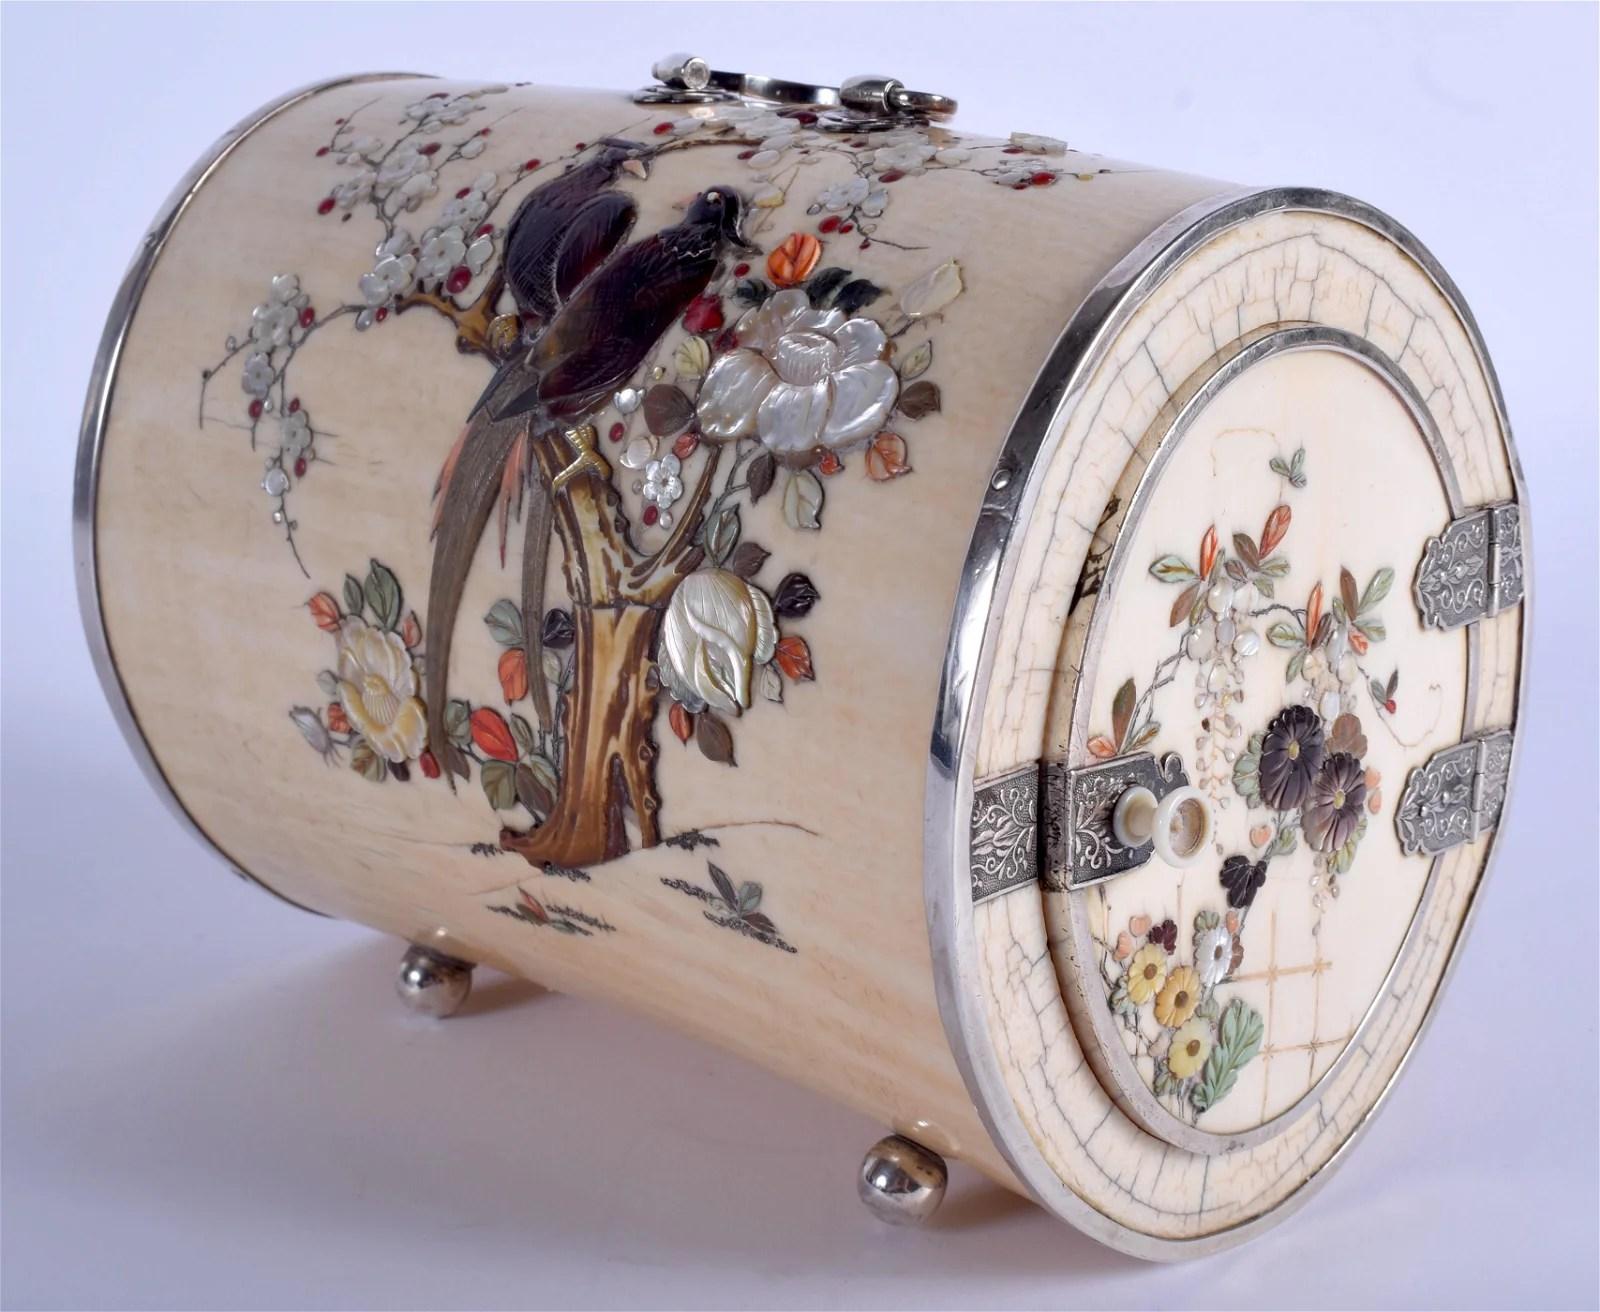 A FINE 19TH CENTURY JAPANESE MEIJI PERIOD SHIBAYAMA